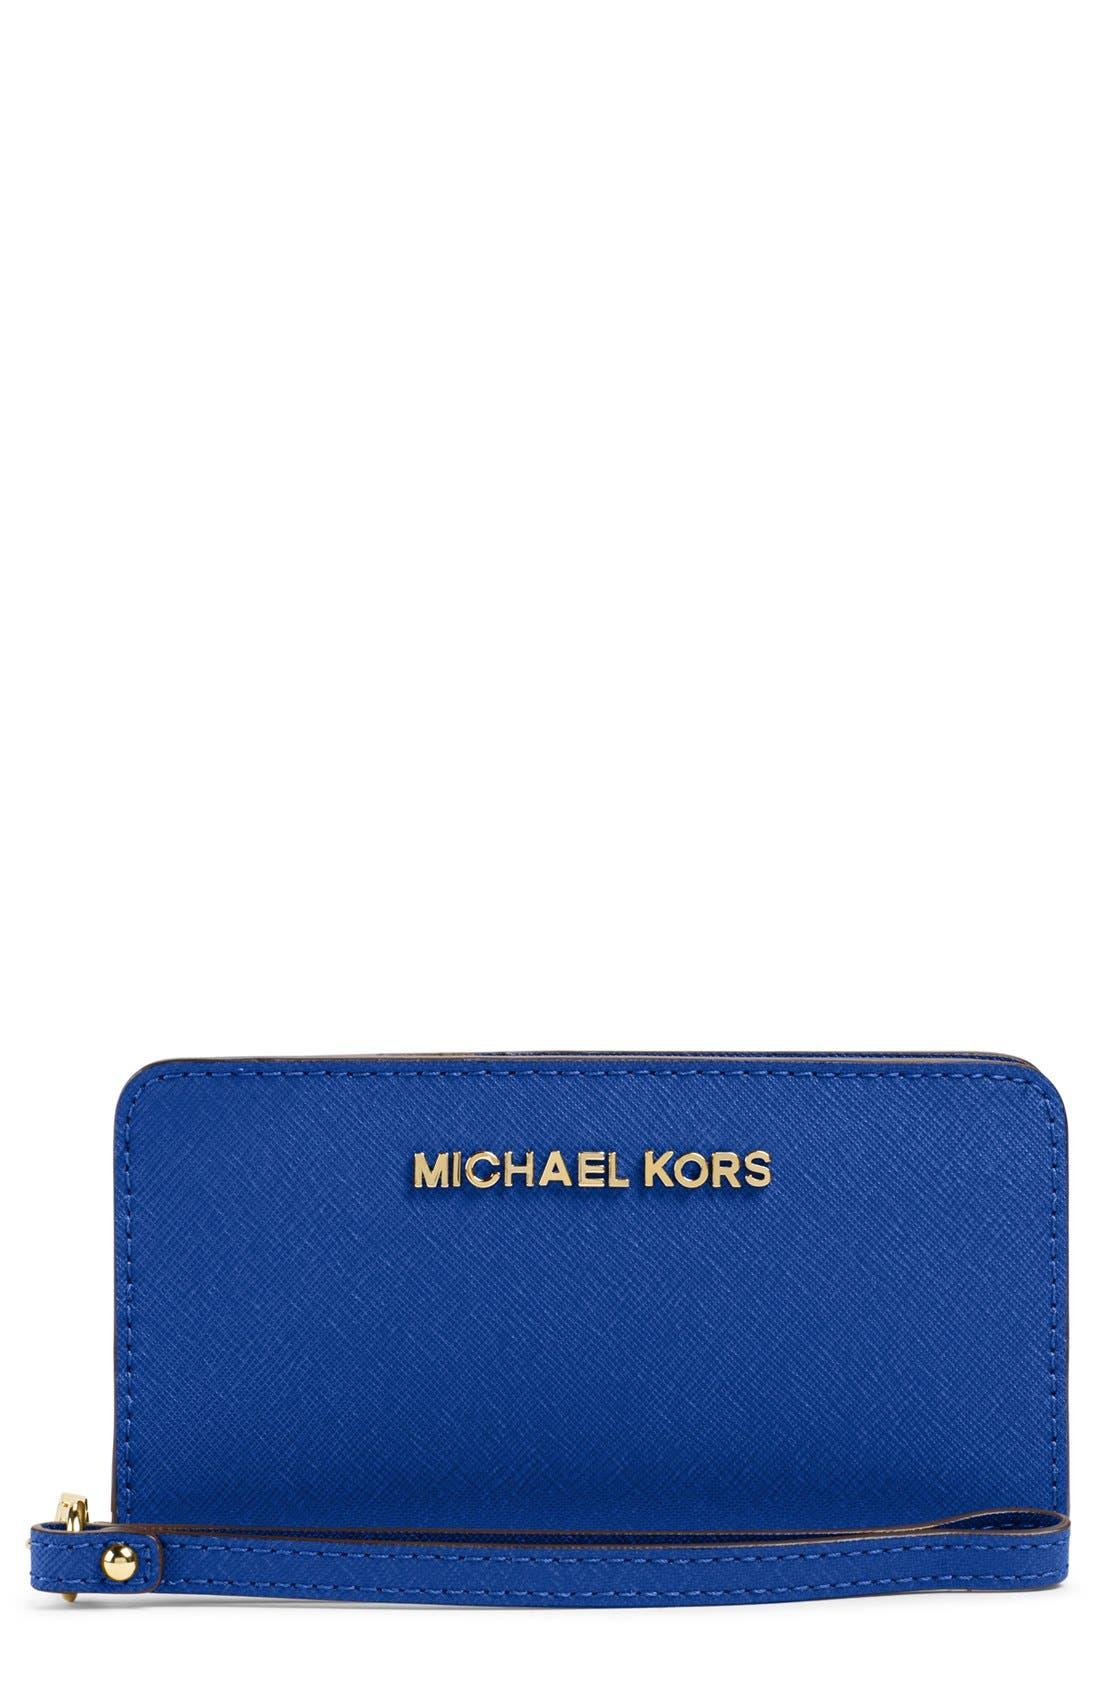 Main Image - MICHAEL Michael Kors Saffiano Leather Phone Wallet